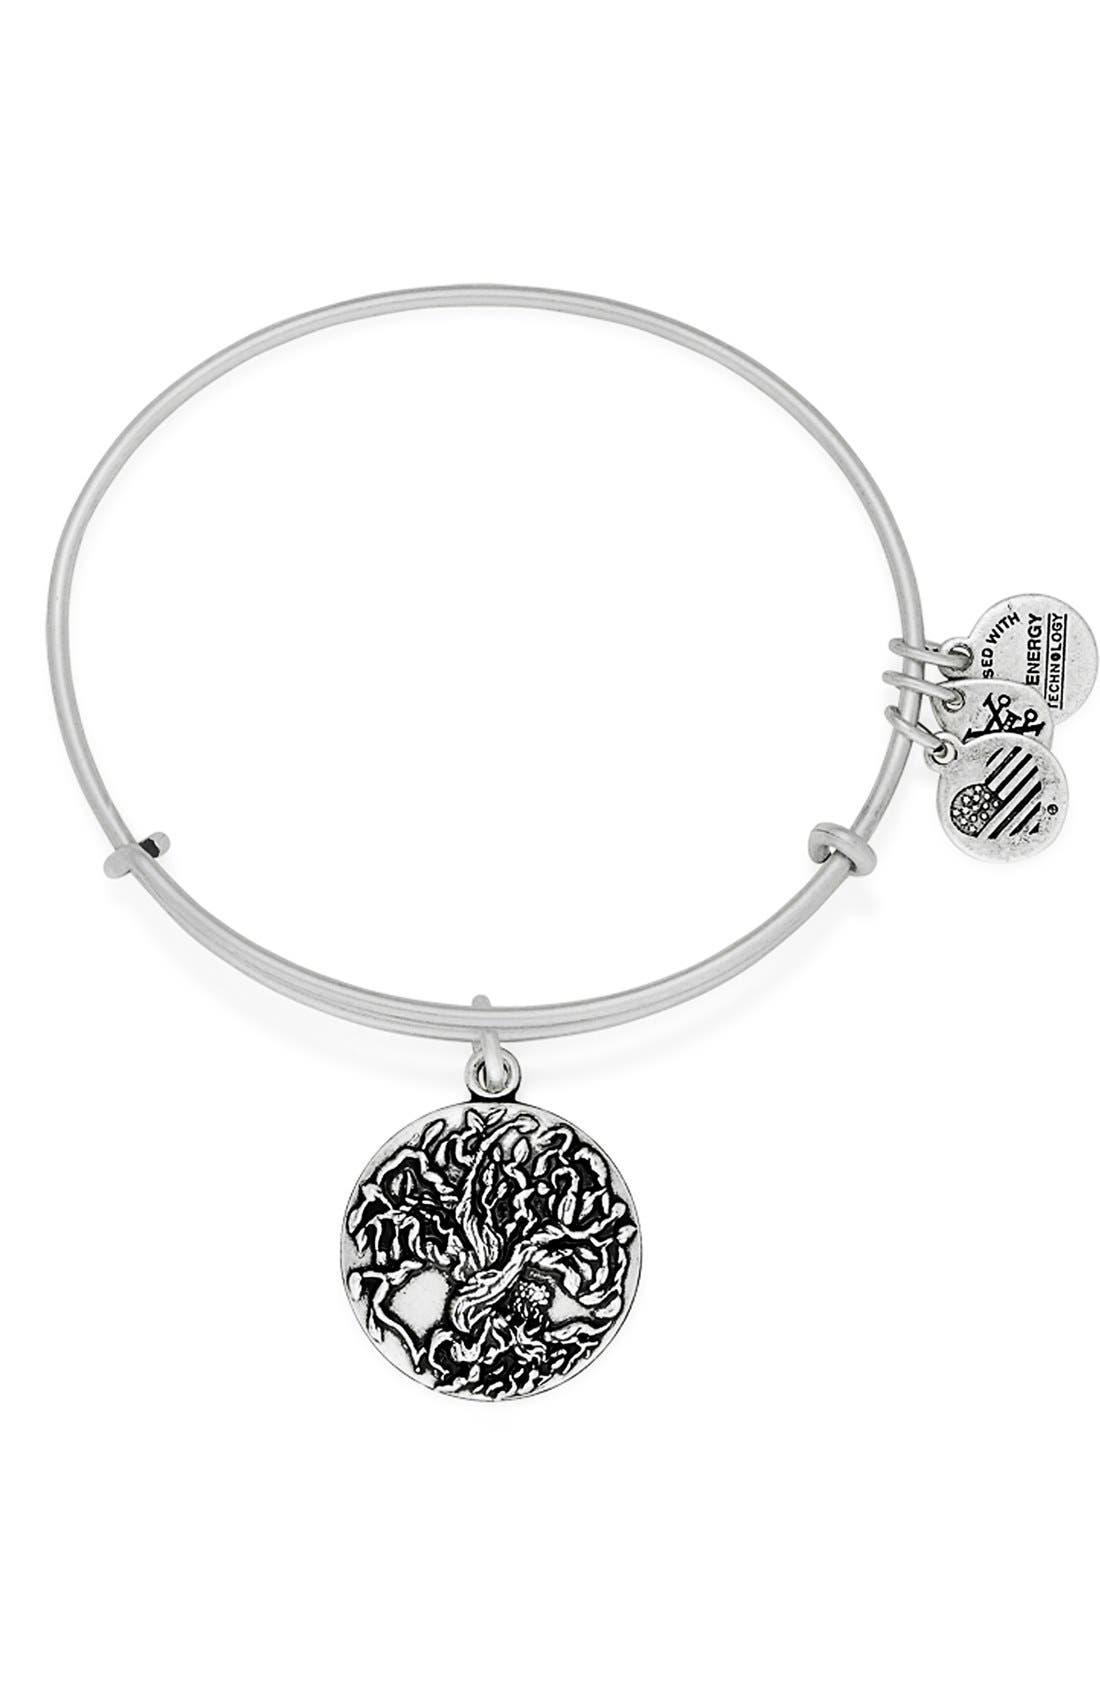 Main Image - Alex and Ani 'Tree of Life' Bangle Bracelet